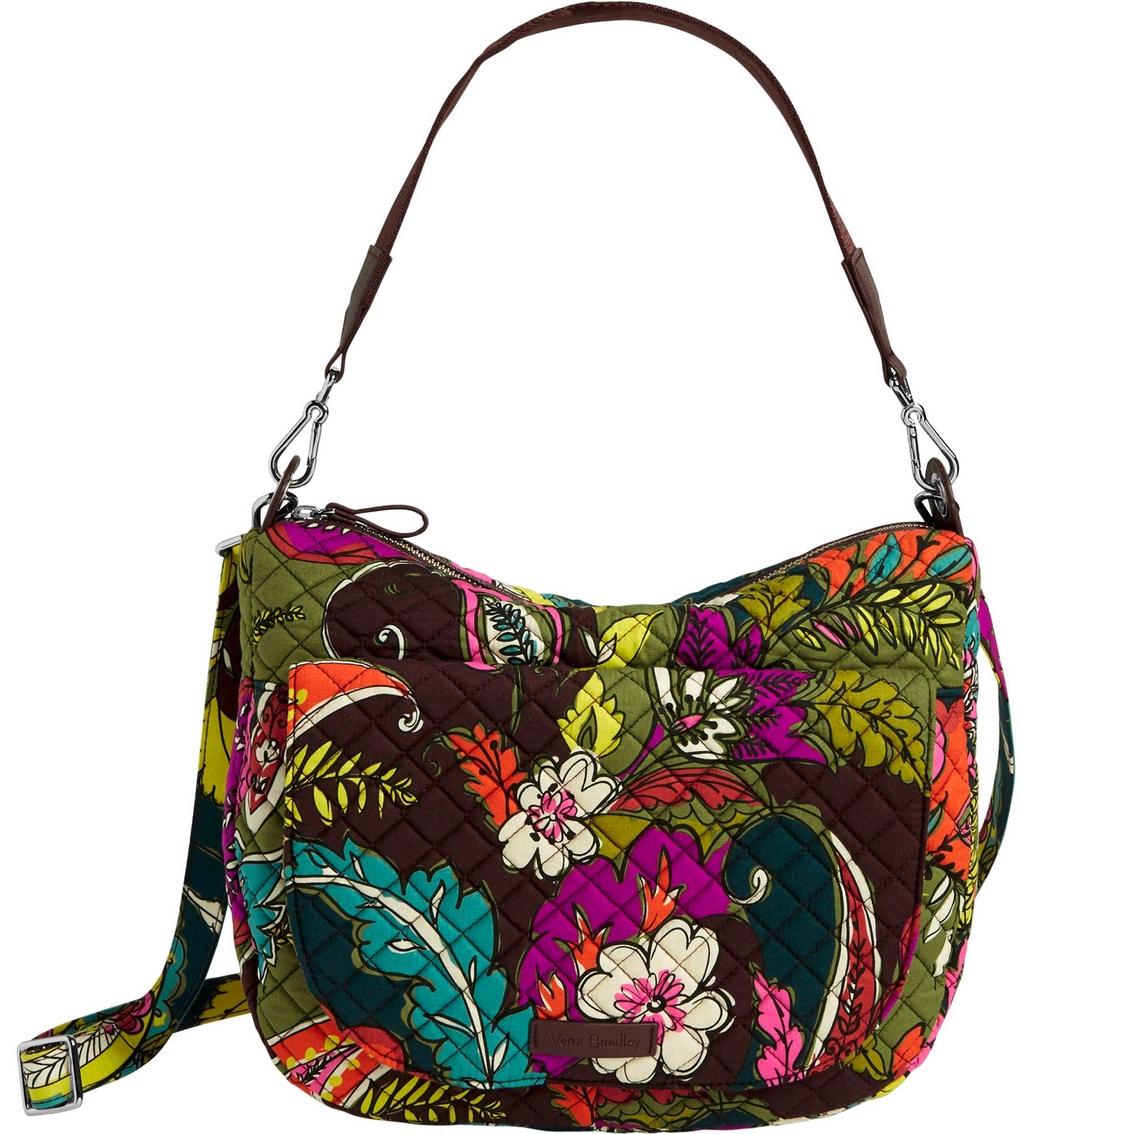 Vera Bradley Carson Shoulder Bag, Autumn Leaves | Shop By Pattern ...